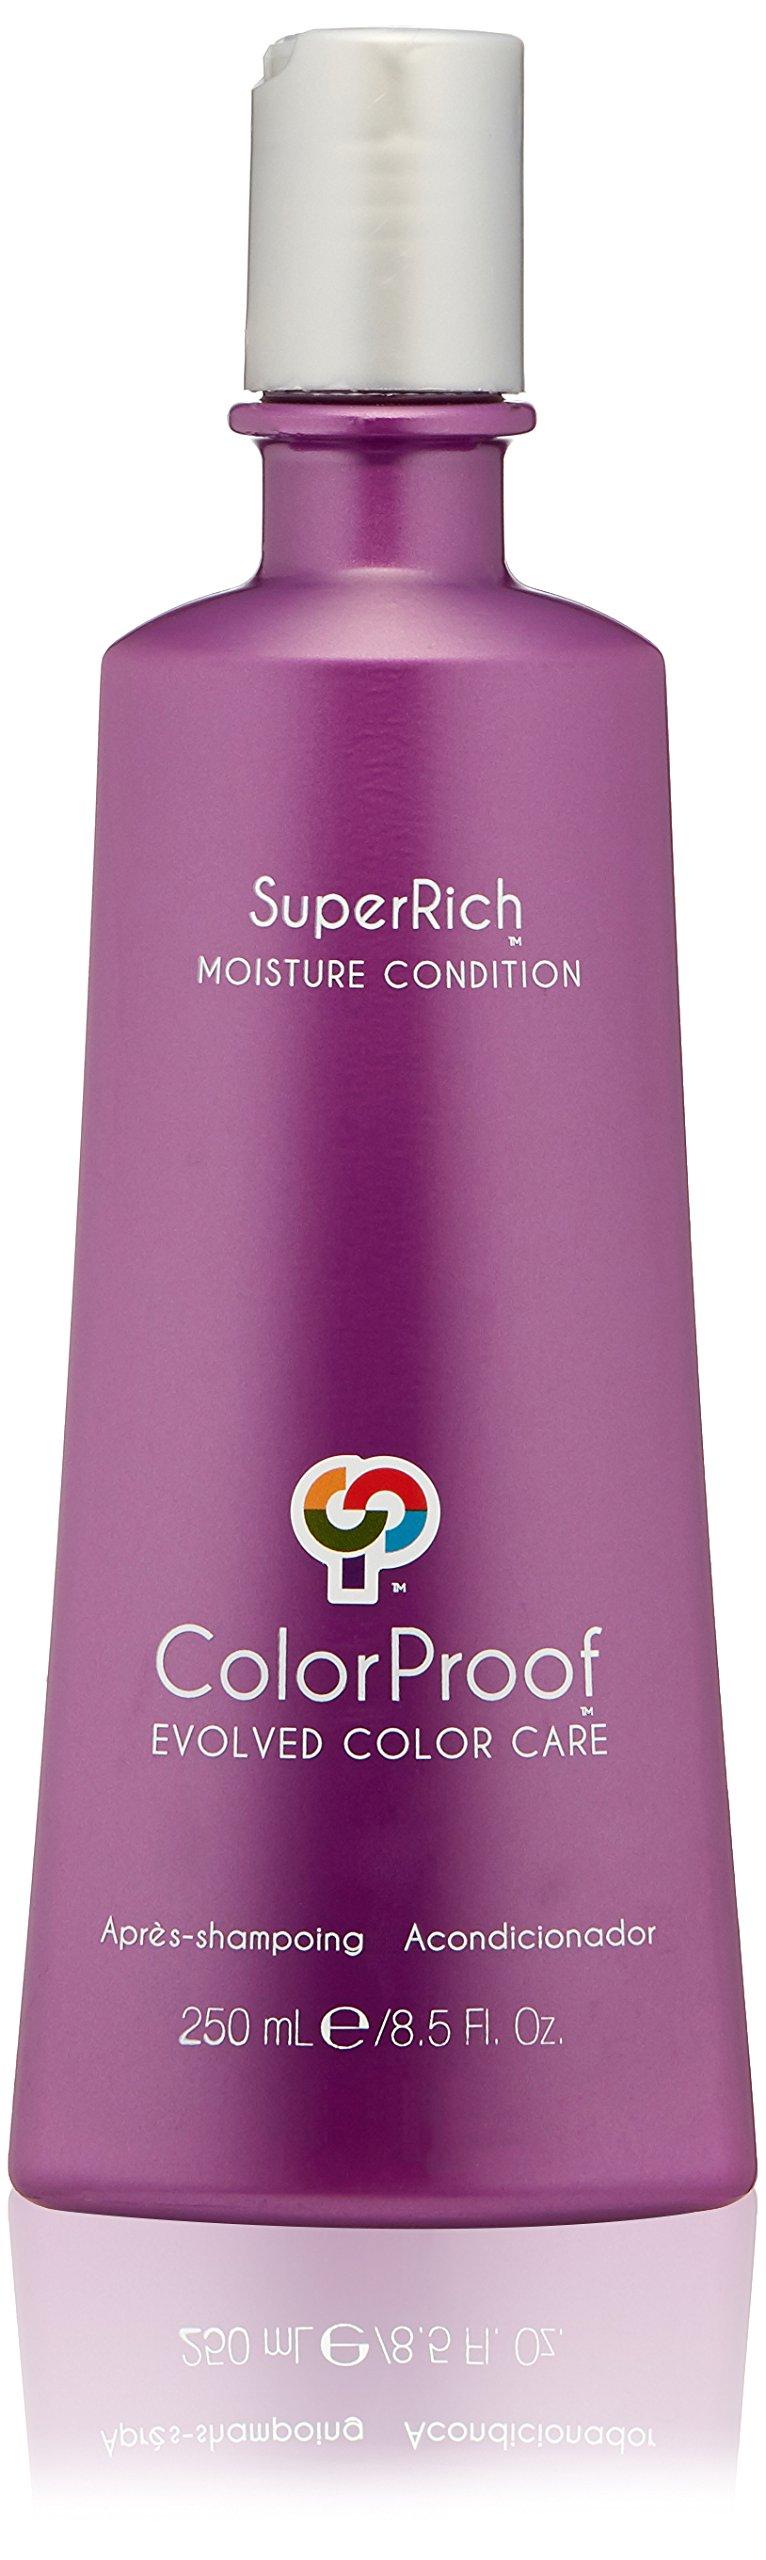 ColorProof SuperRich Moisture Sulfate-Free Condition 8.5 Fl. Oz.